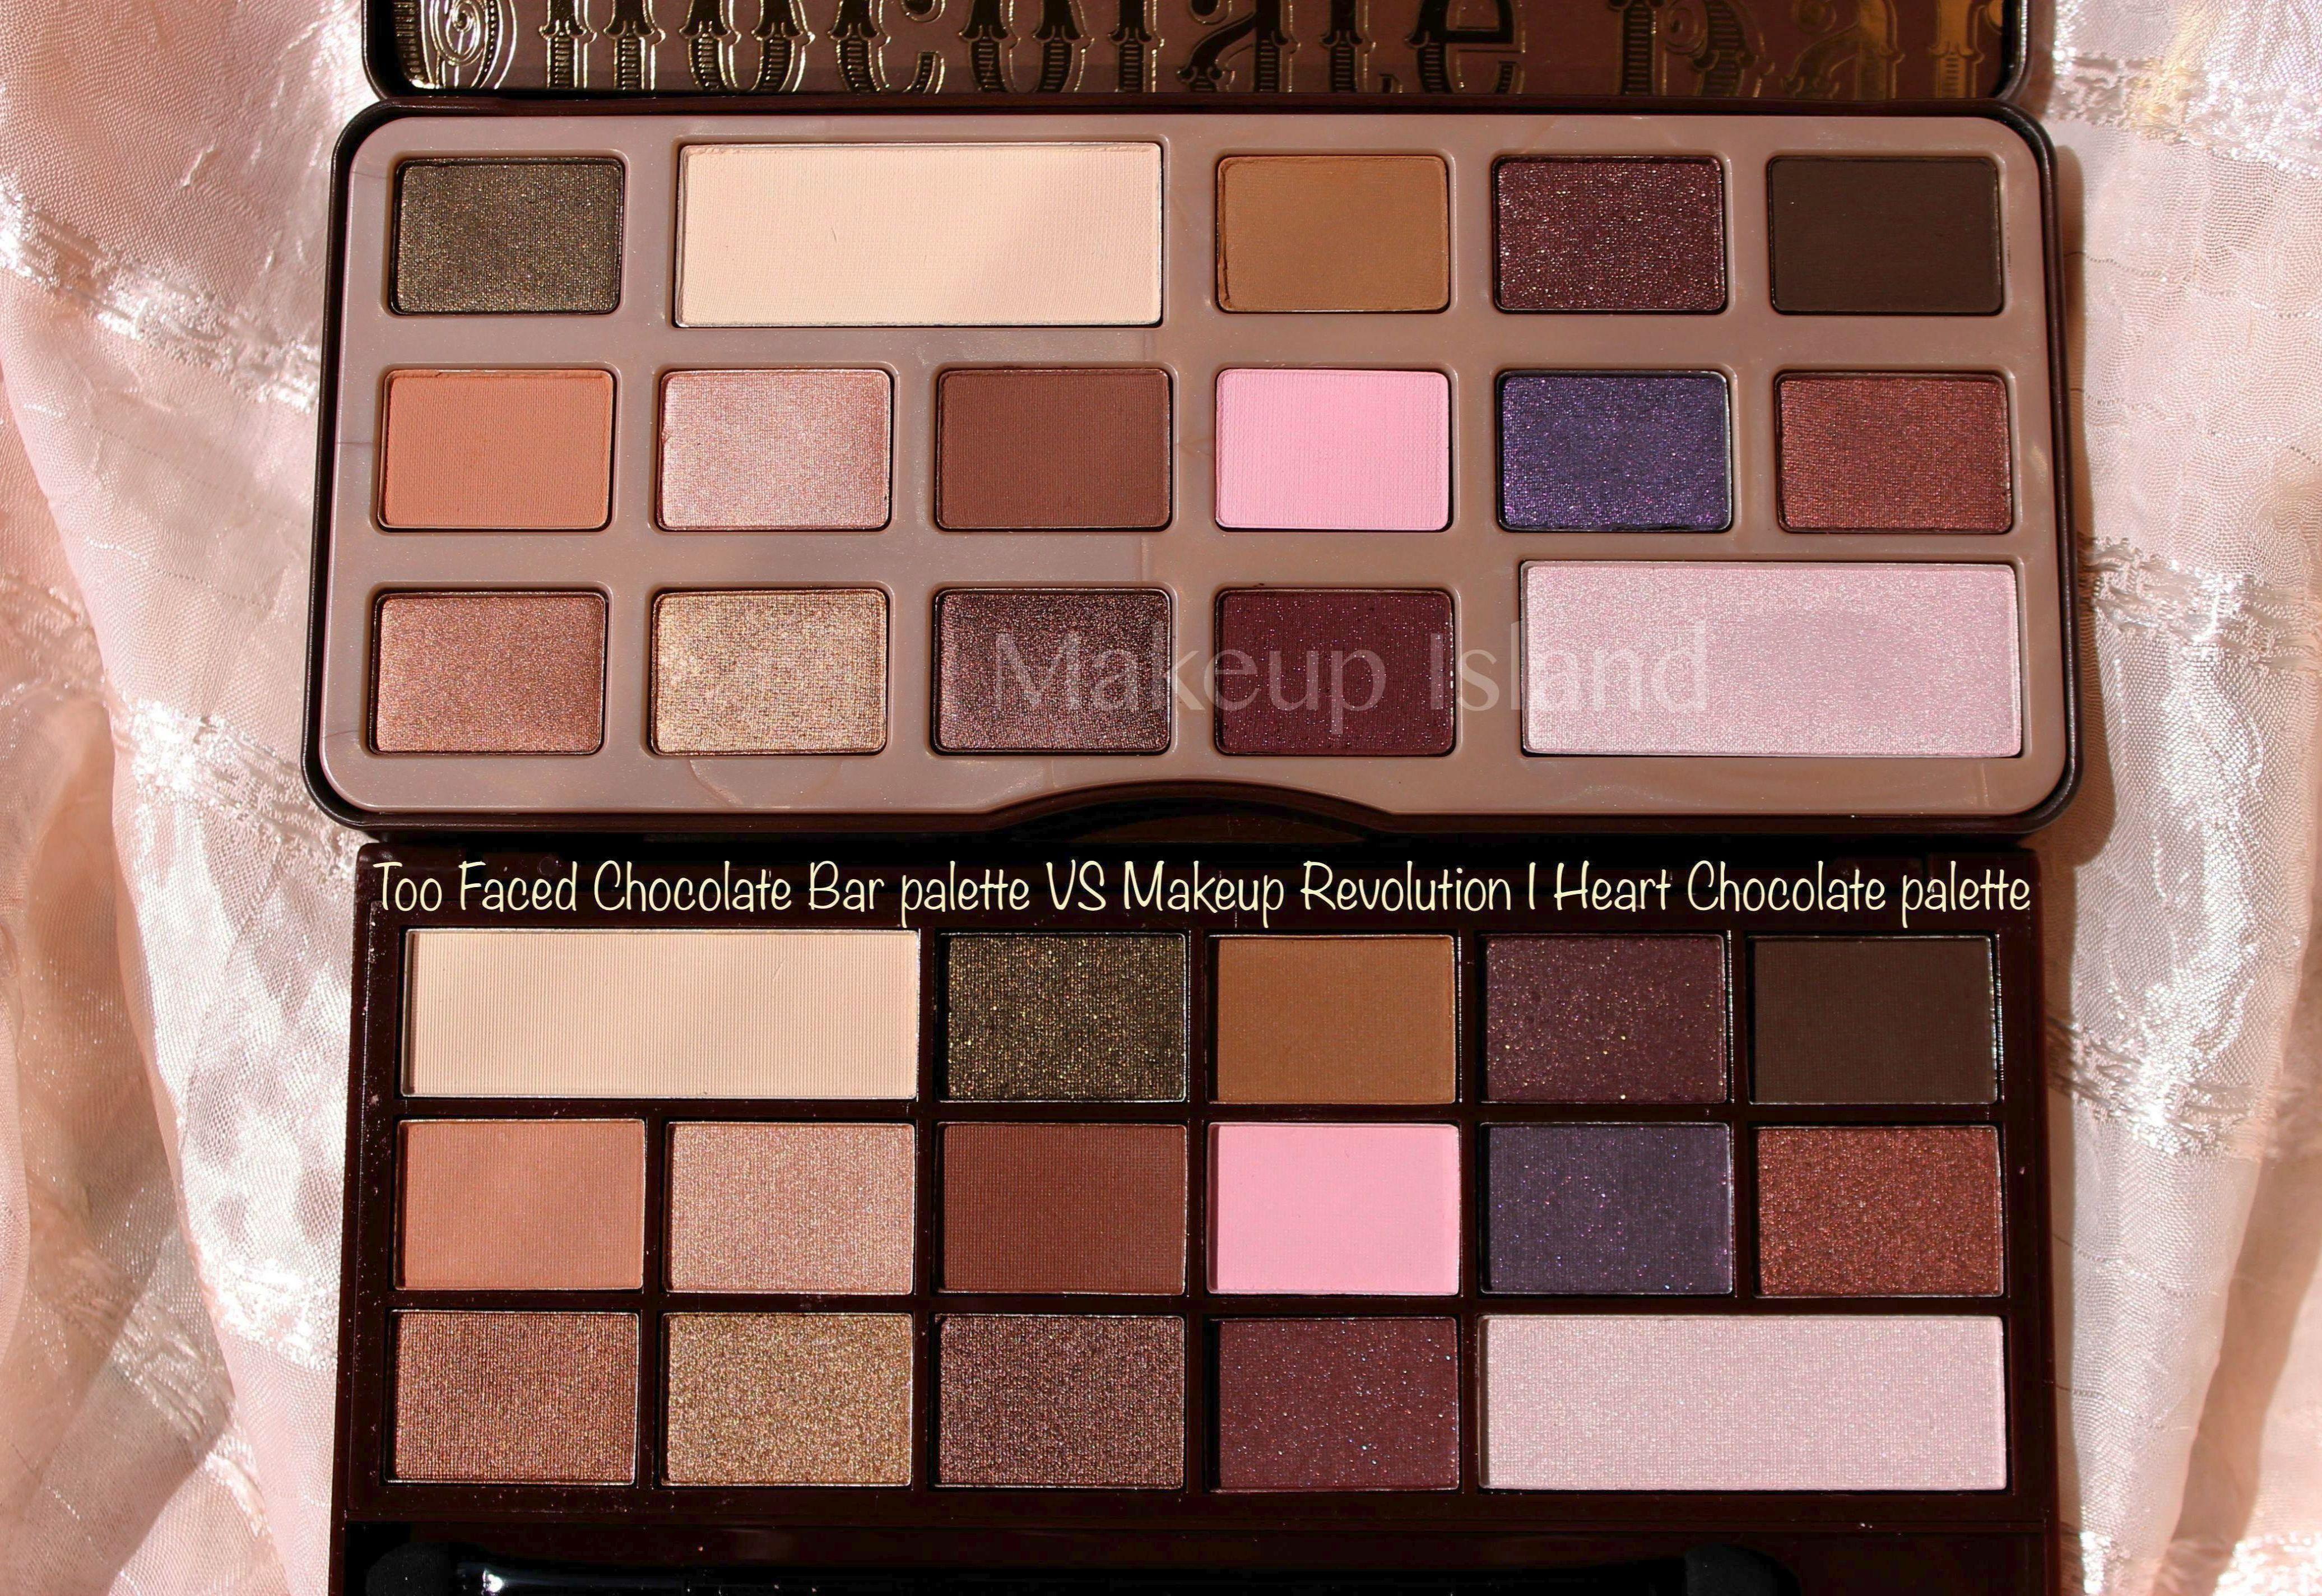 Hush Makeup Dupe List Makeup Dupe Reviews Imitaciones de